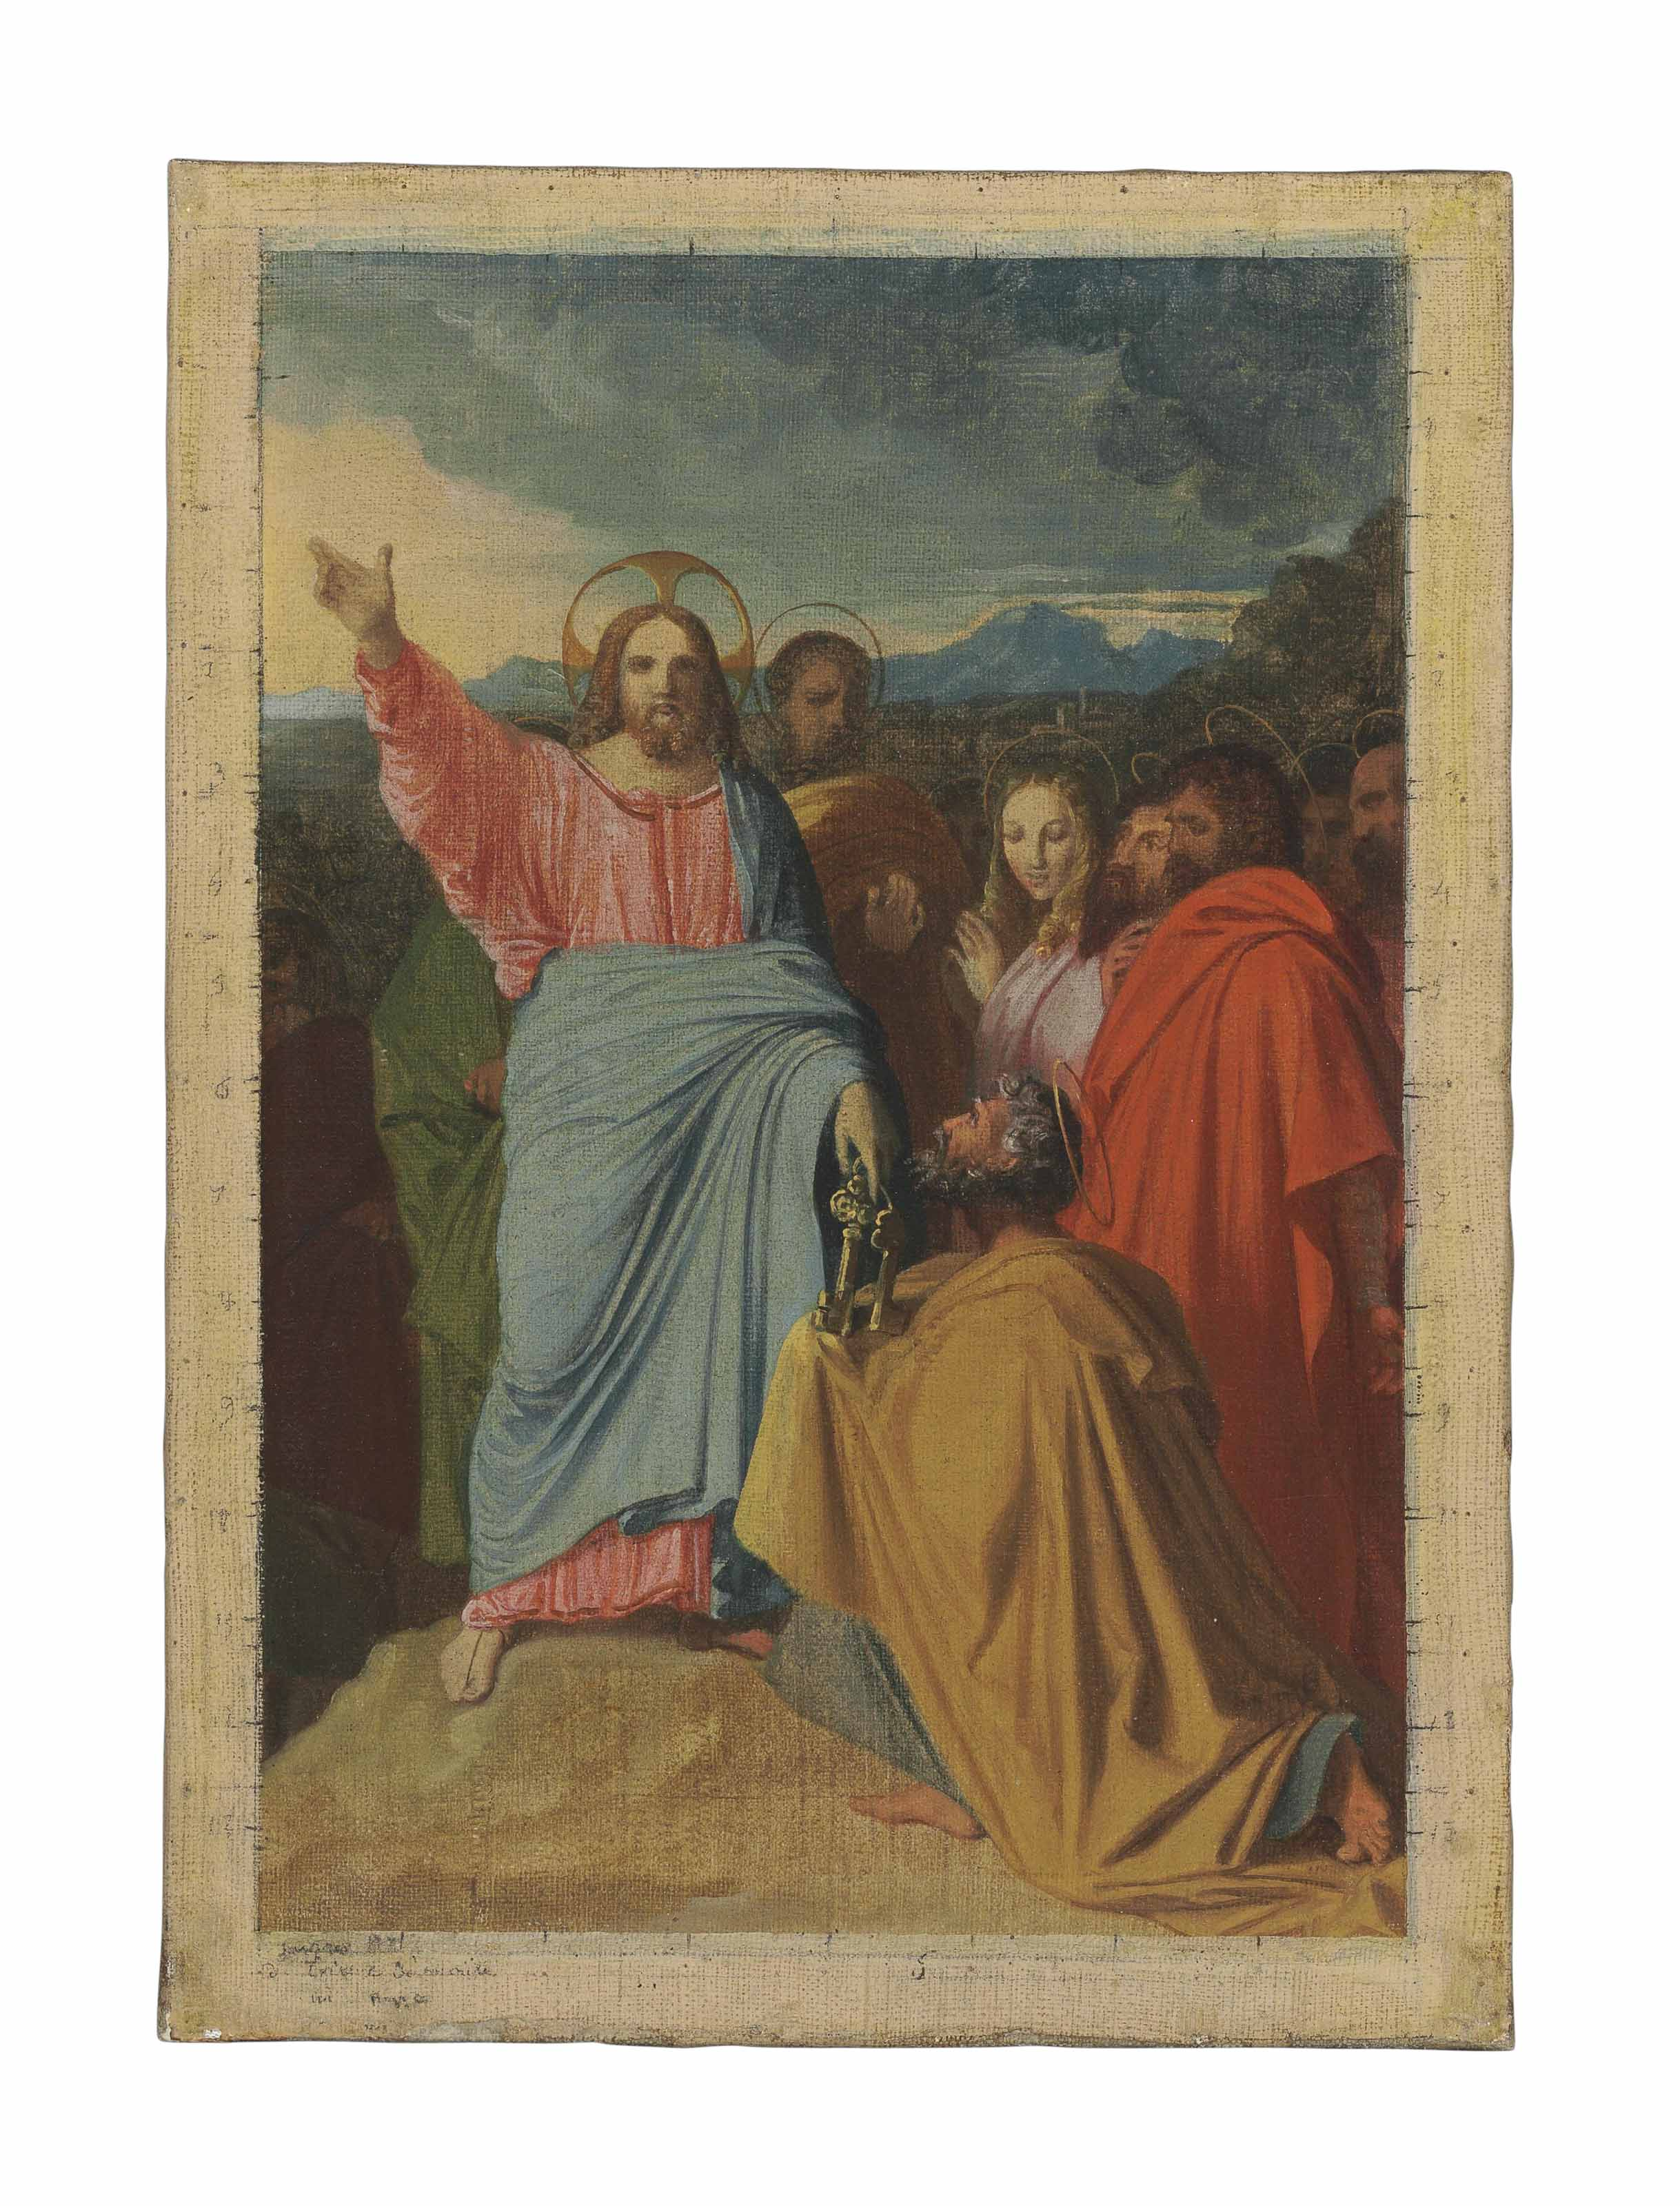 Christ delivering the Keys to St. Peter